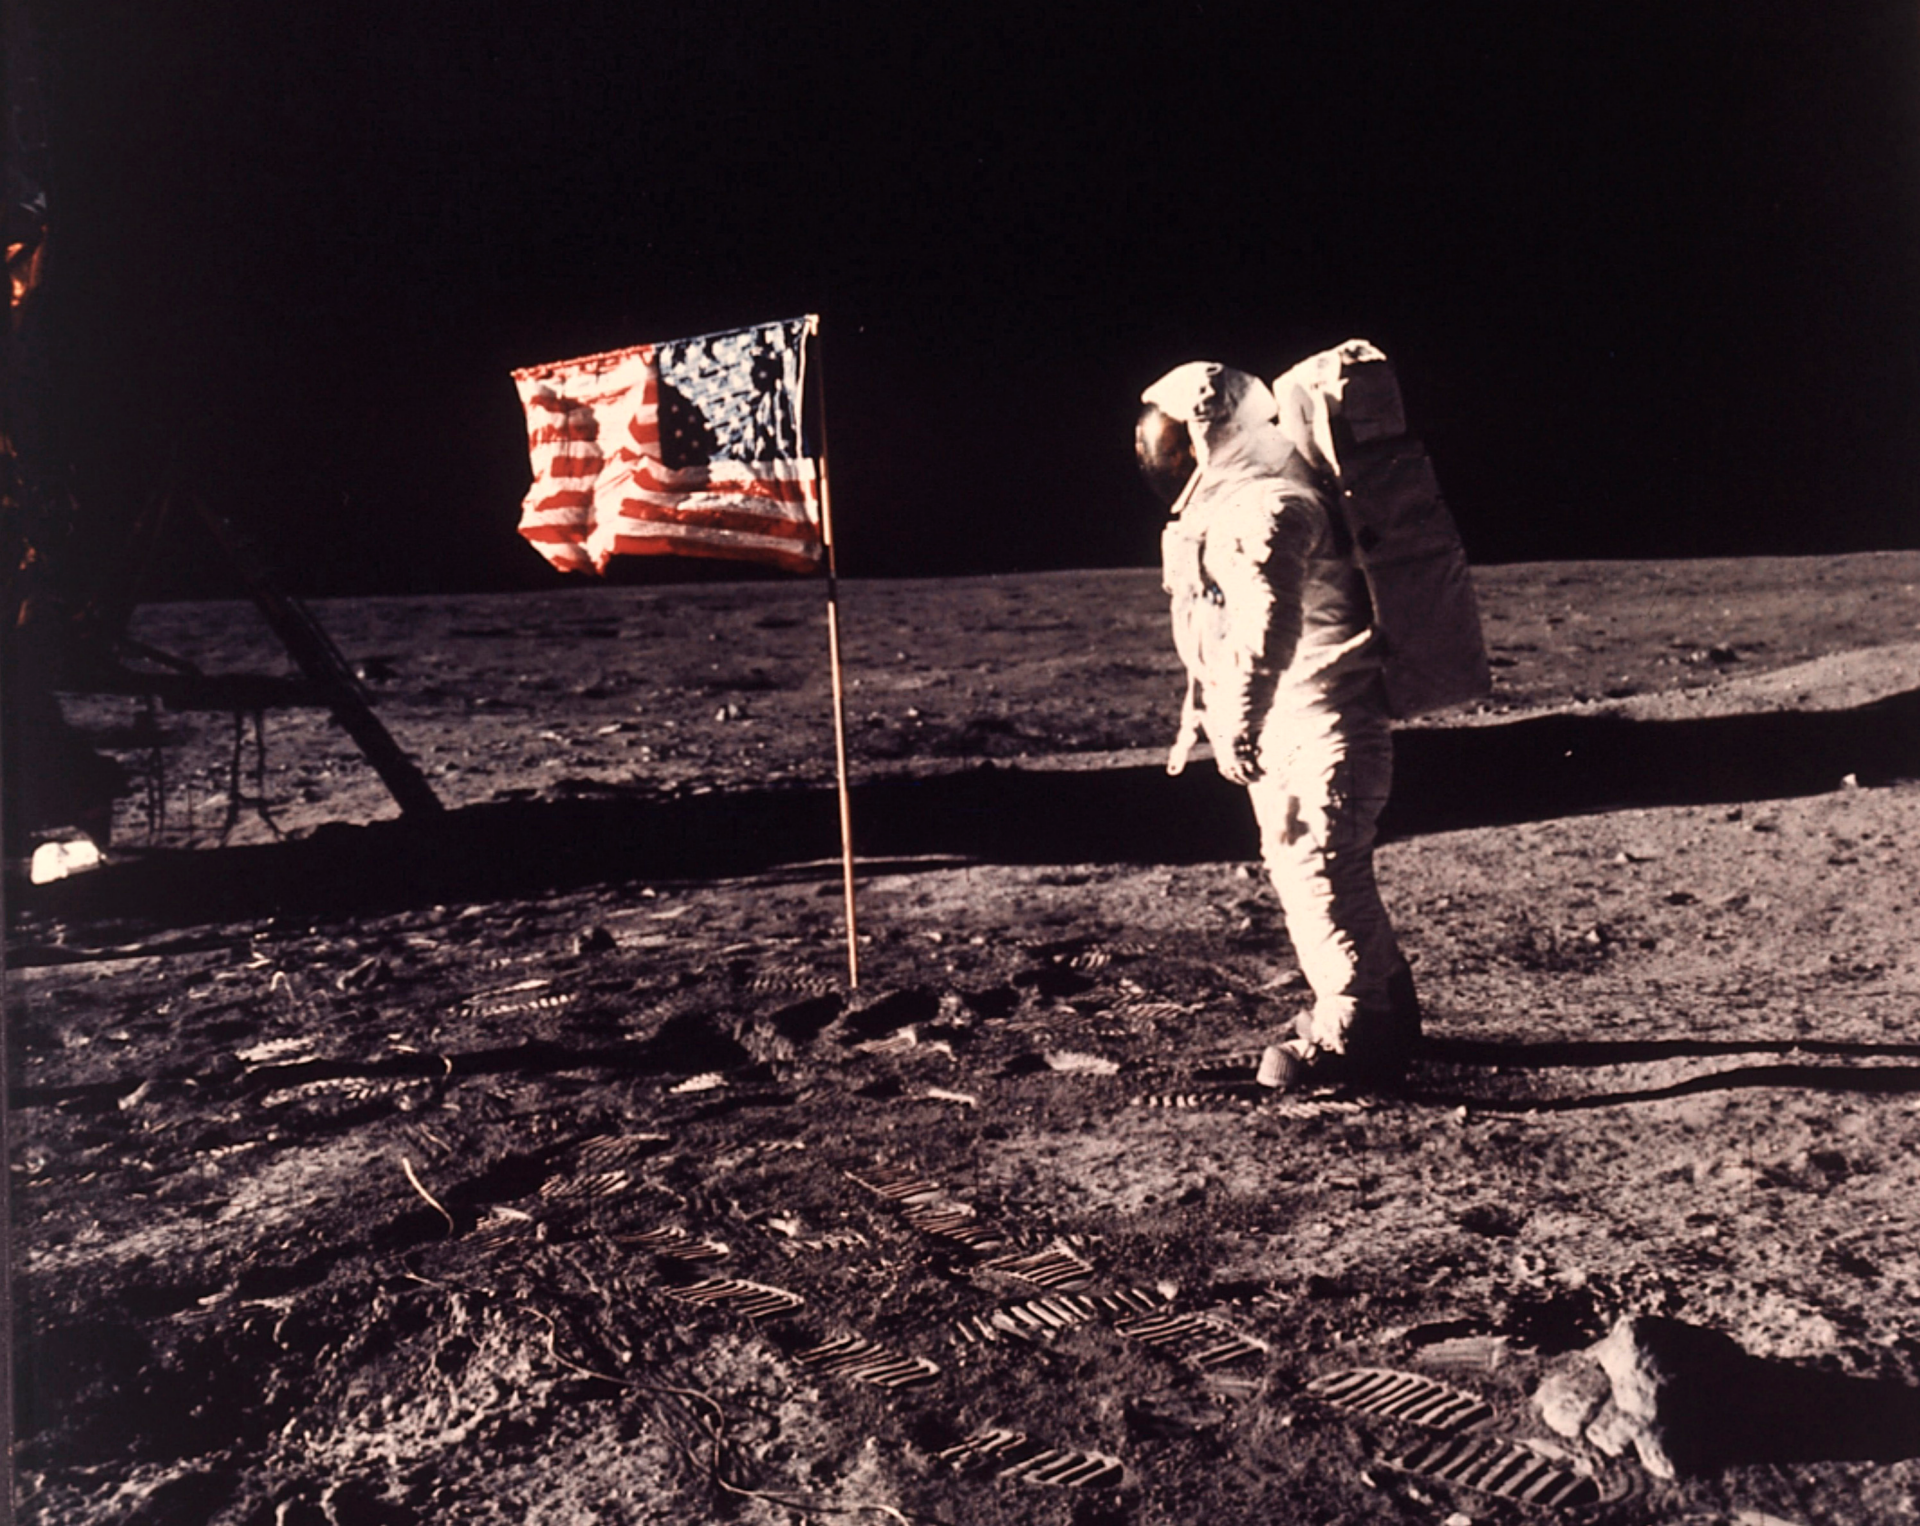 Apollo 11: Smithsonian showcases amazing Moon landing artifacts